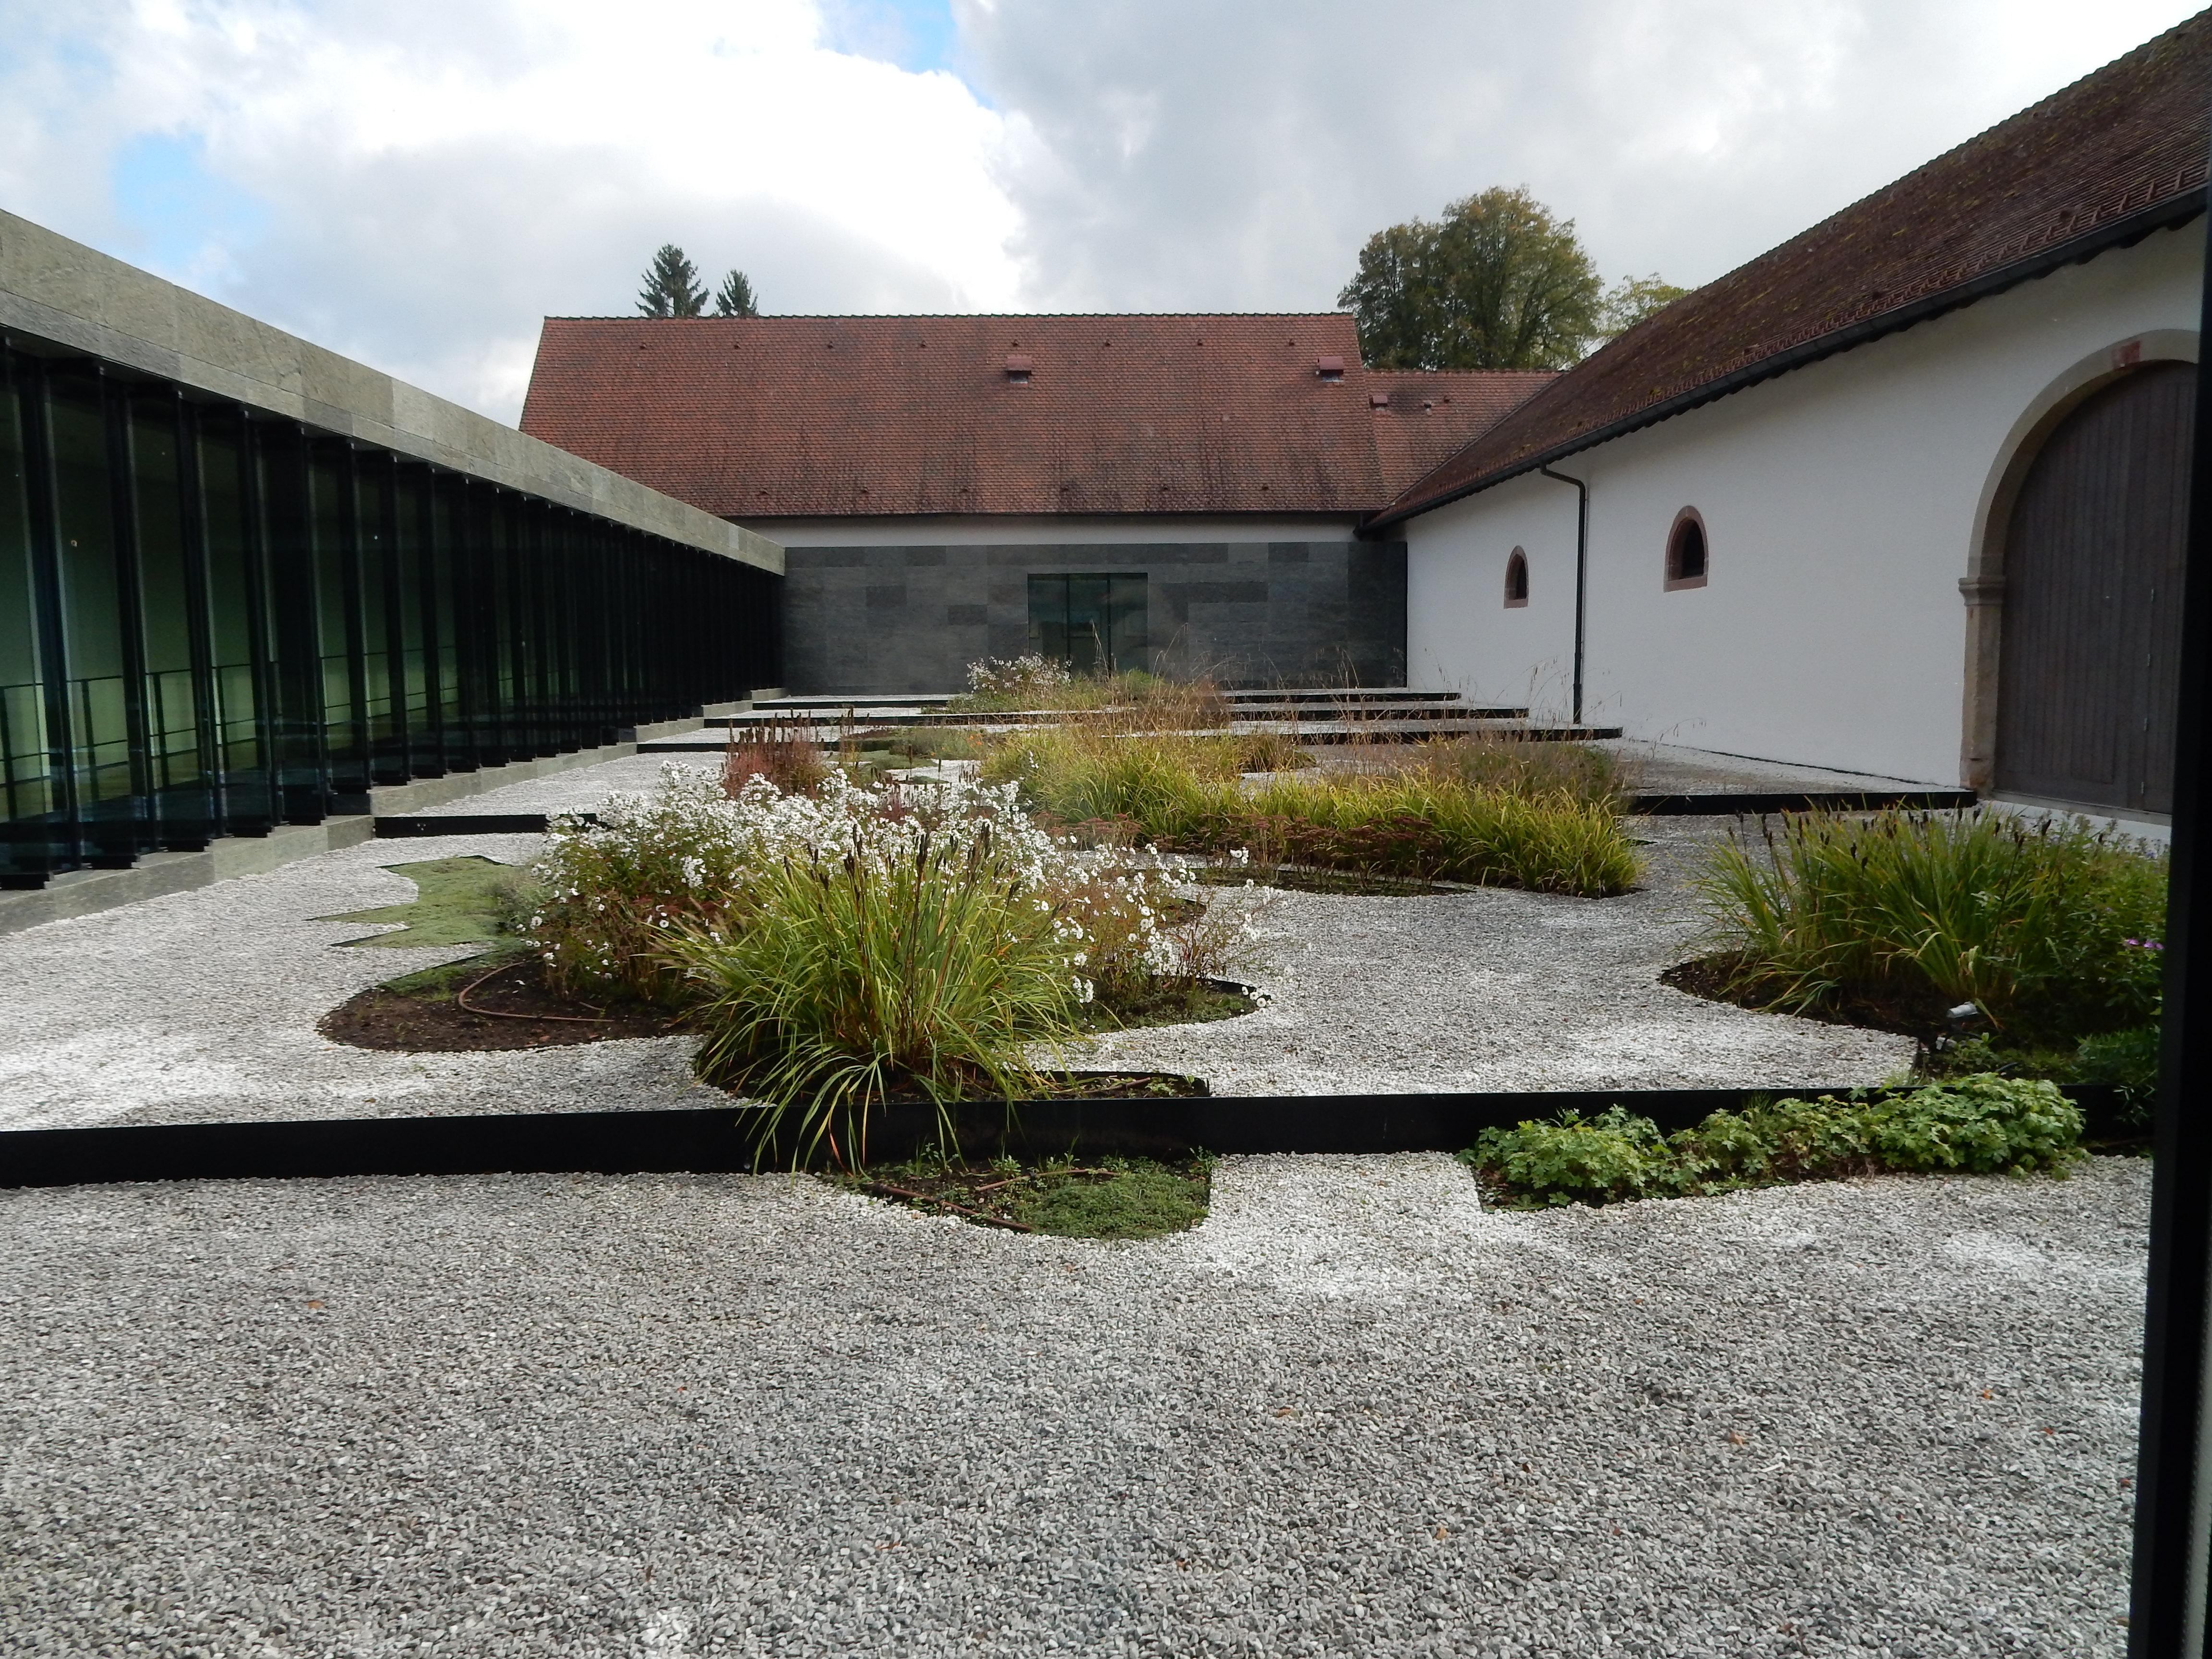 Musée Lalique, Wingen-sur-Moder, binnenplaats, tuin, exterieur